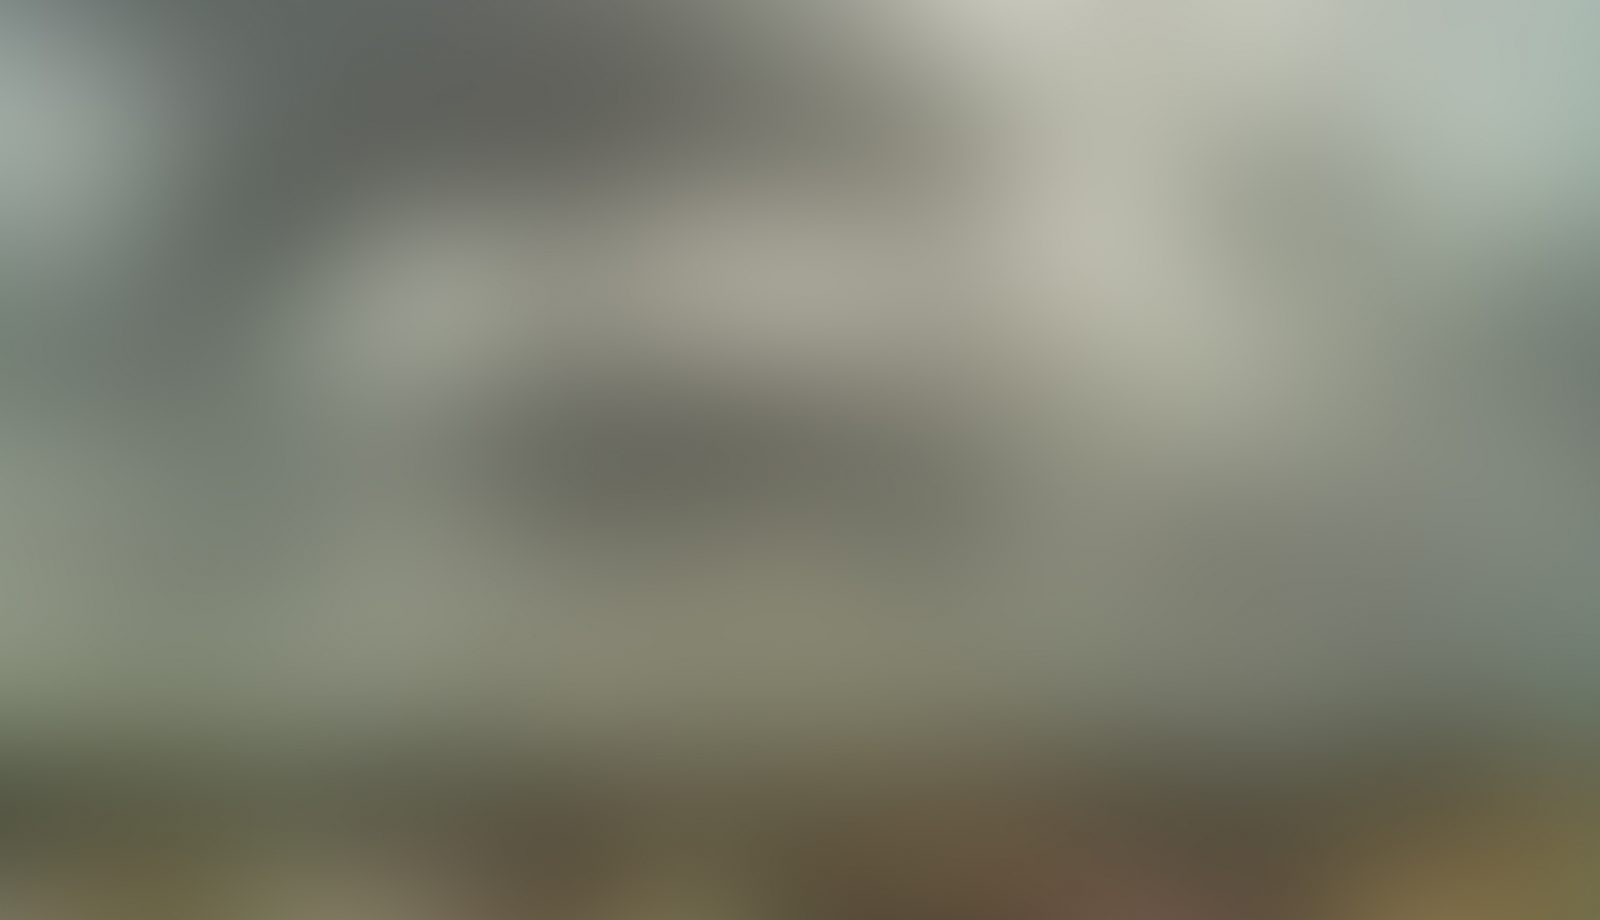 Blurred-Background-8